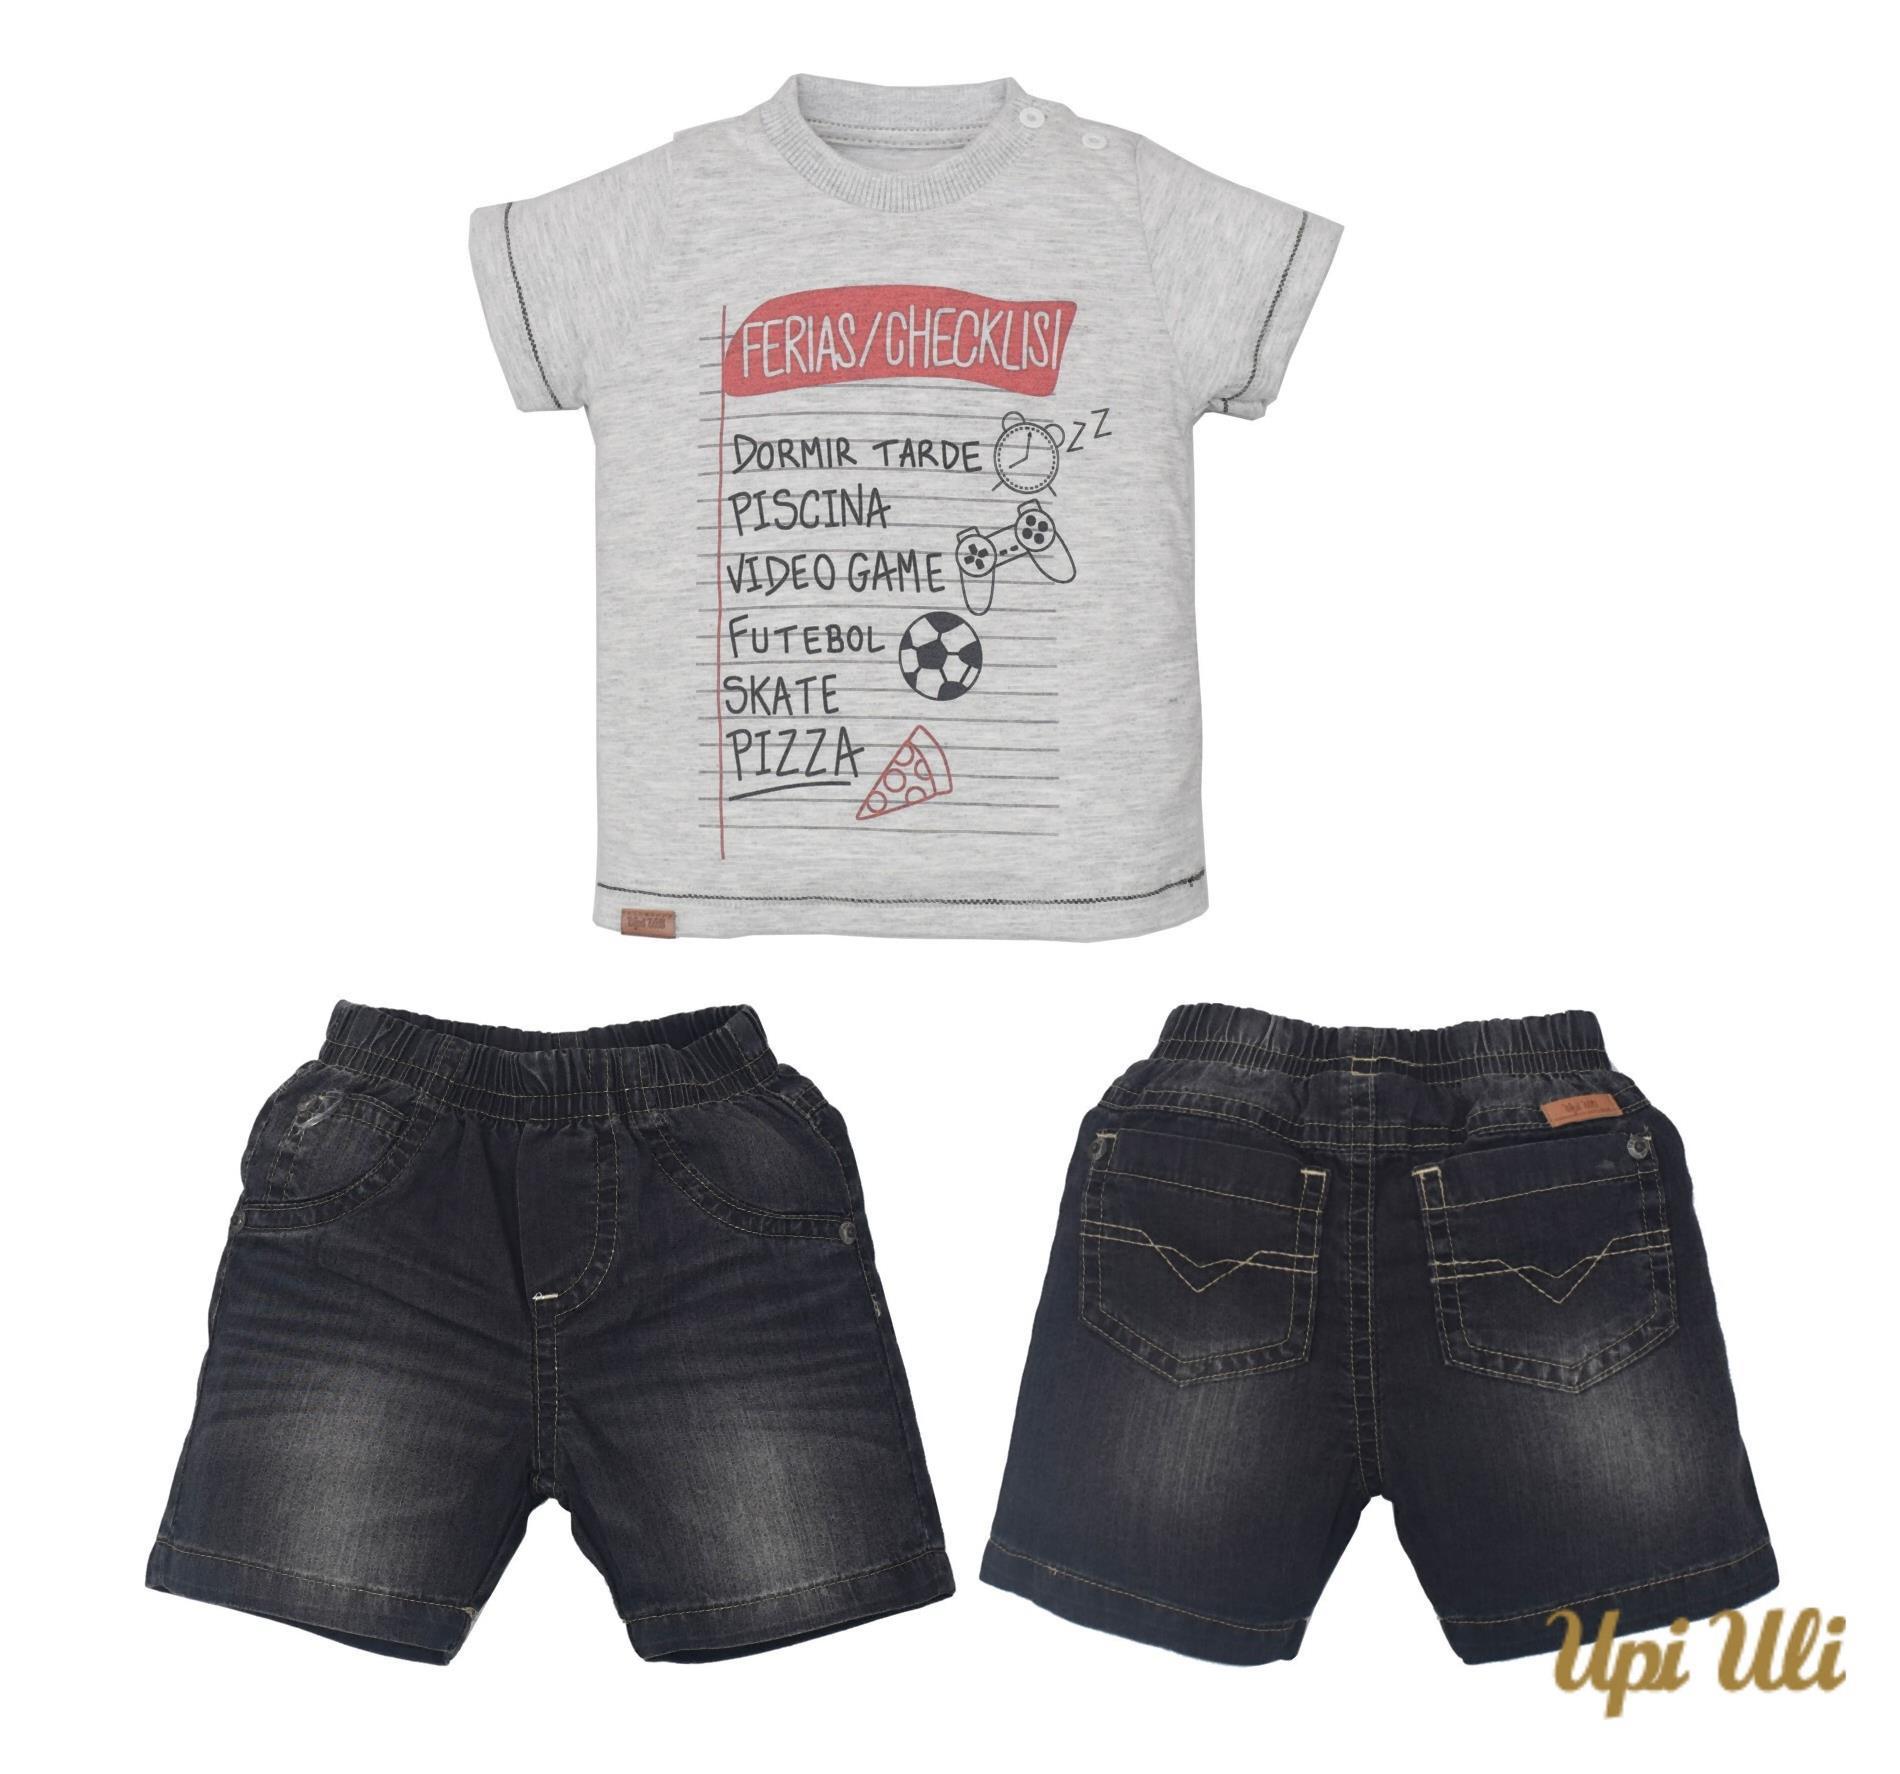 Conj. T-Shirt Meia Malha/Jeans Erick